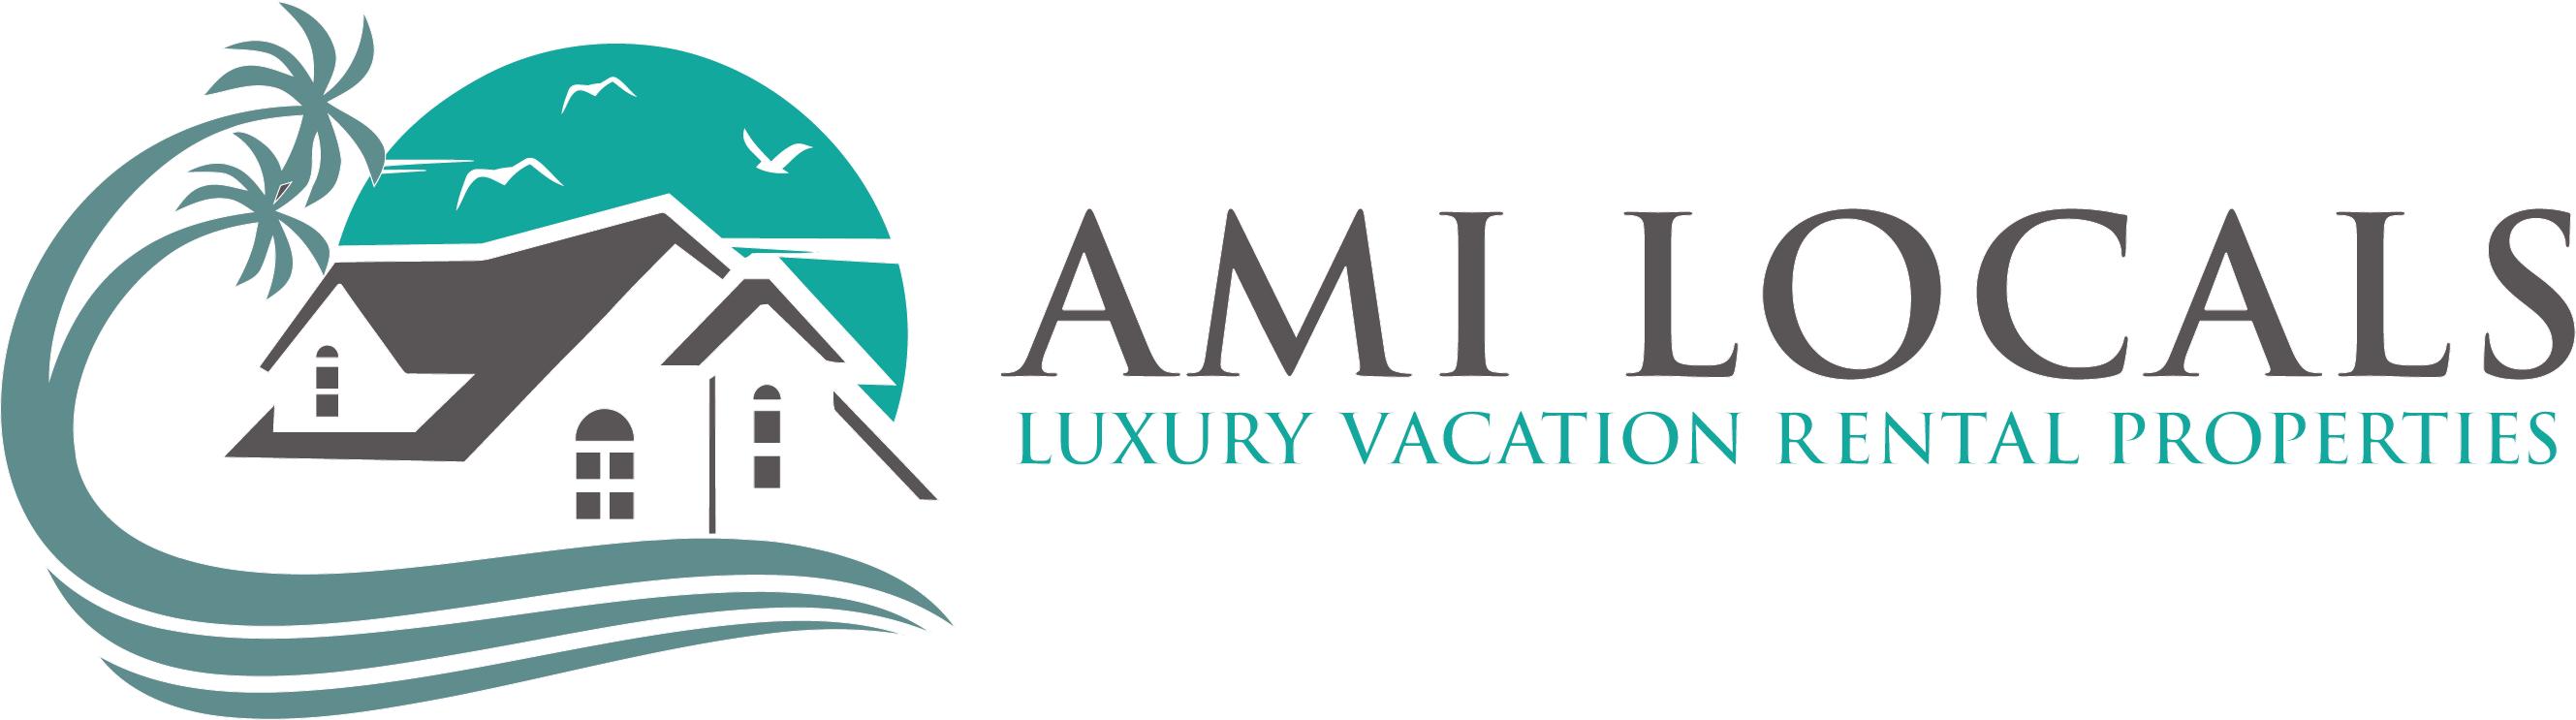 AMI-Locals-Anna-Maria-Island-Luxury-Vacation-Rentals